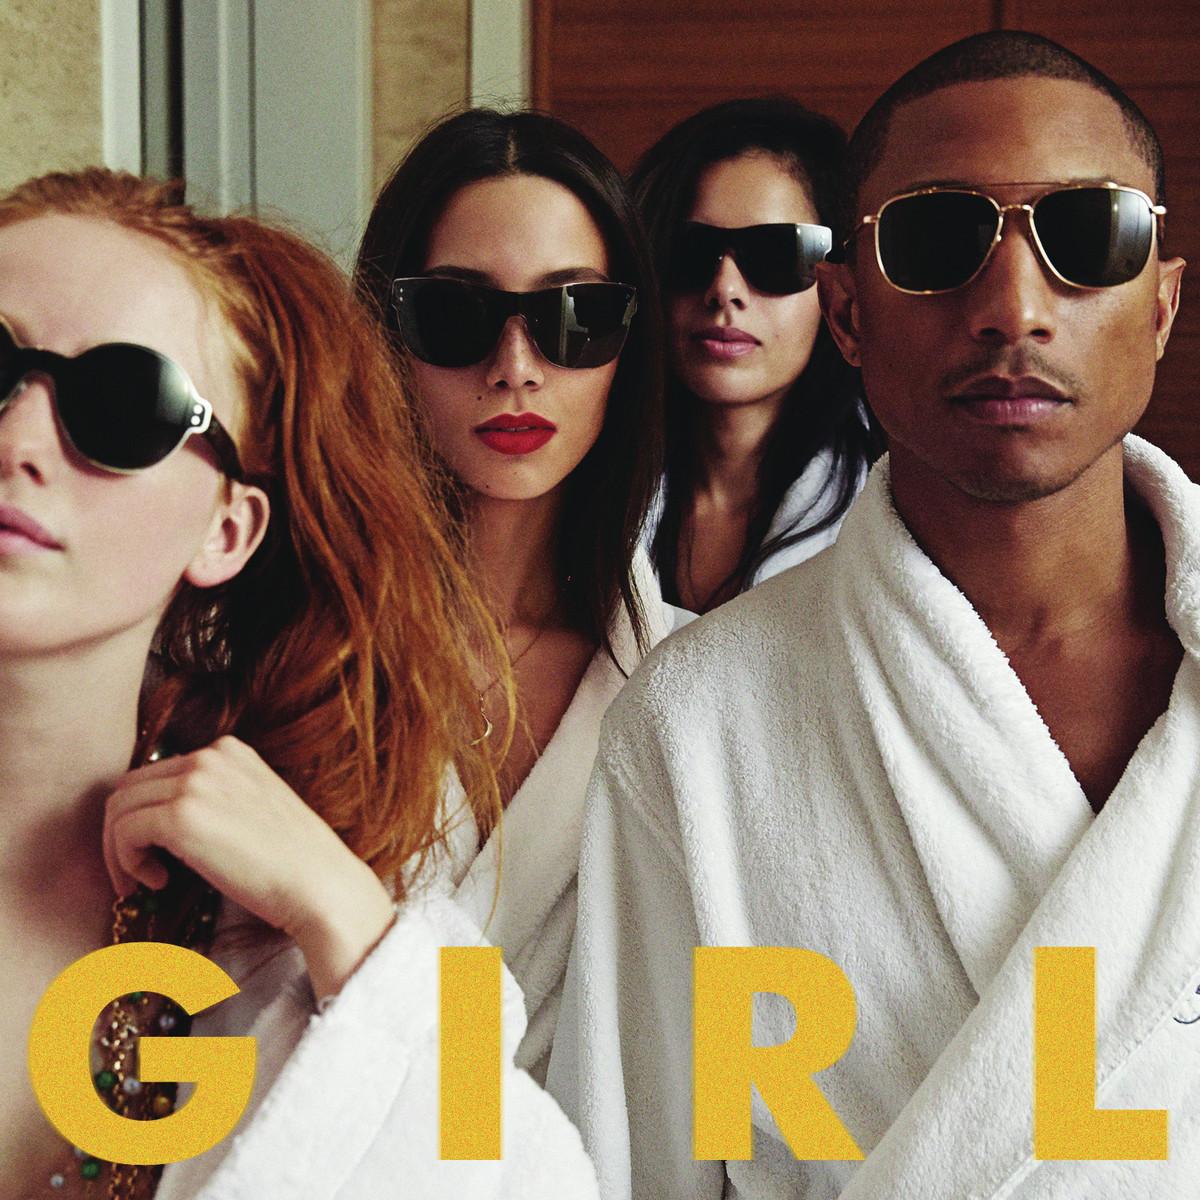 Pharrell-Williams-GIRL-2014-1200x1200.png